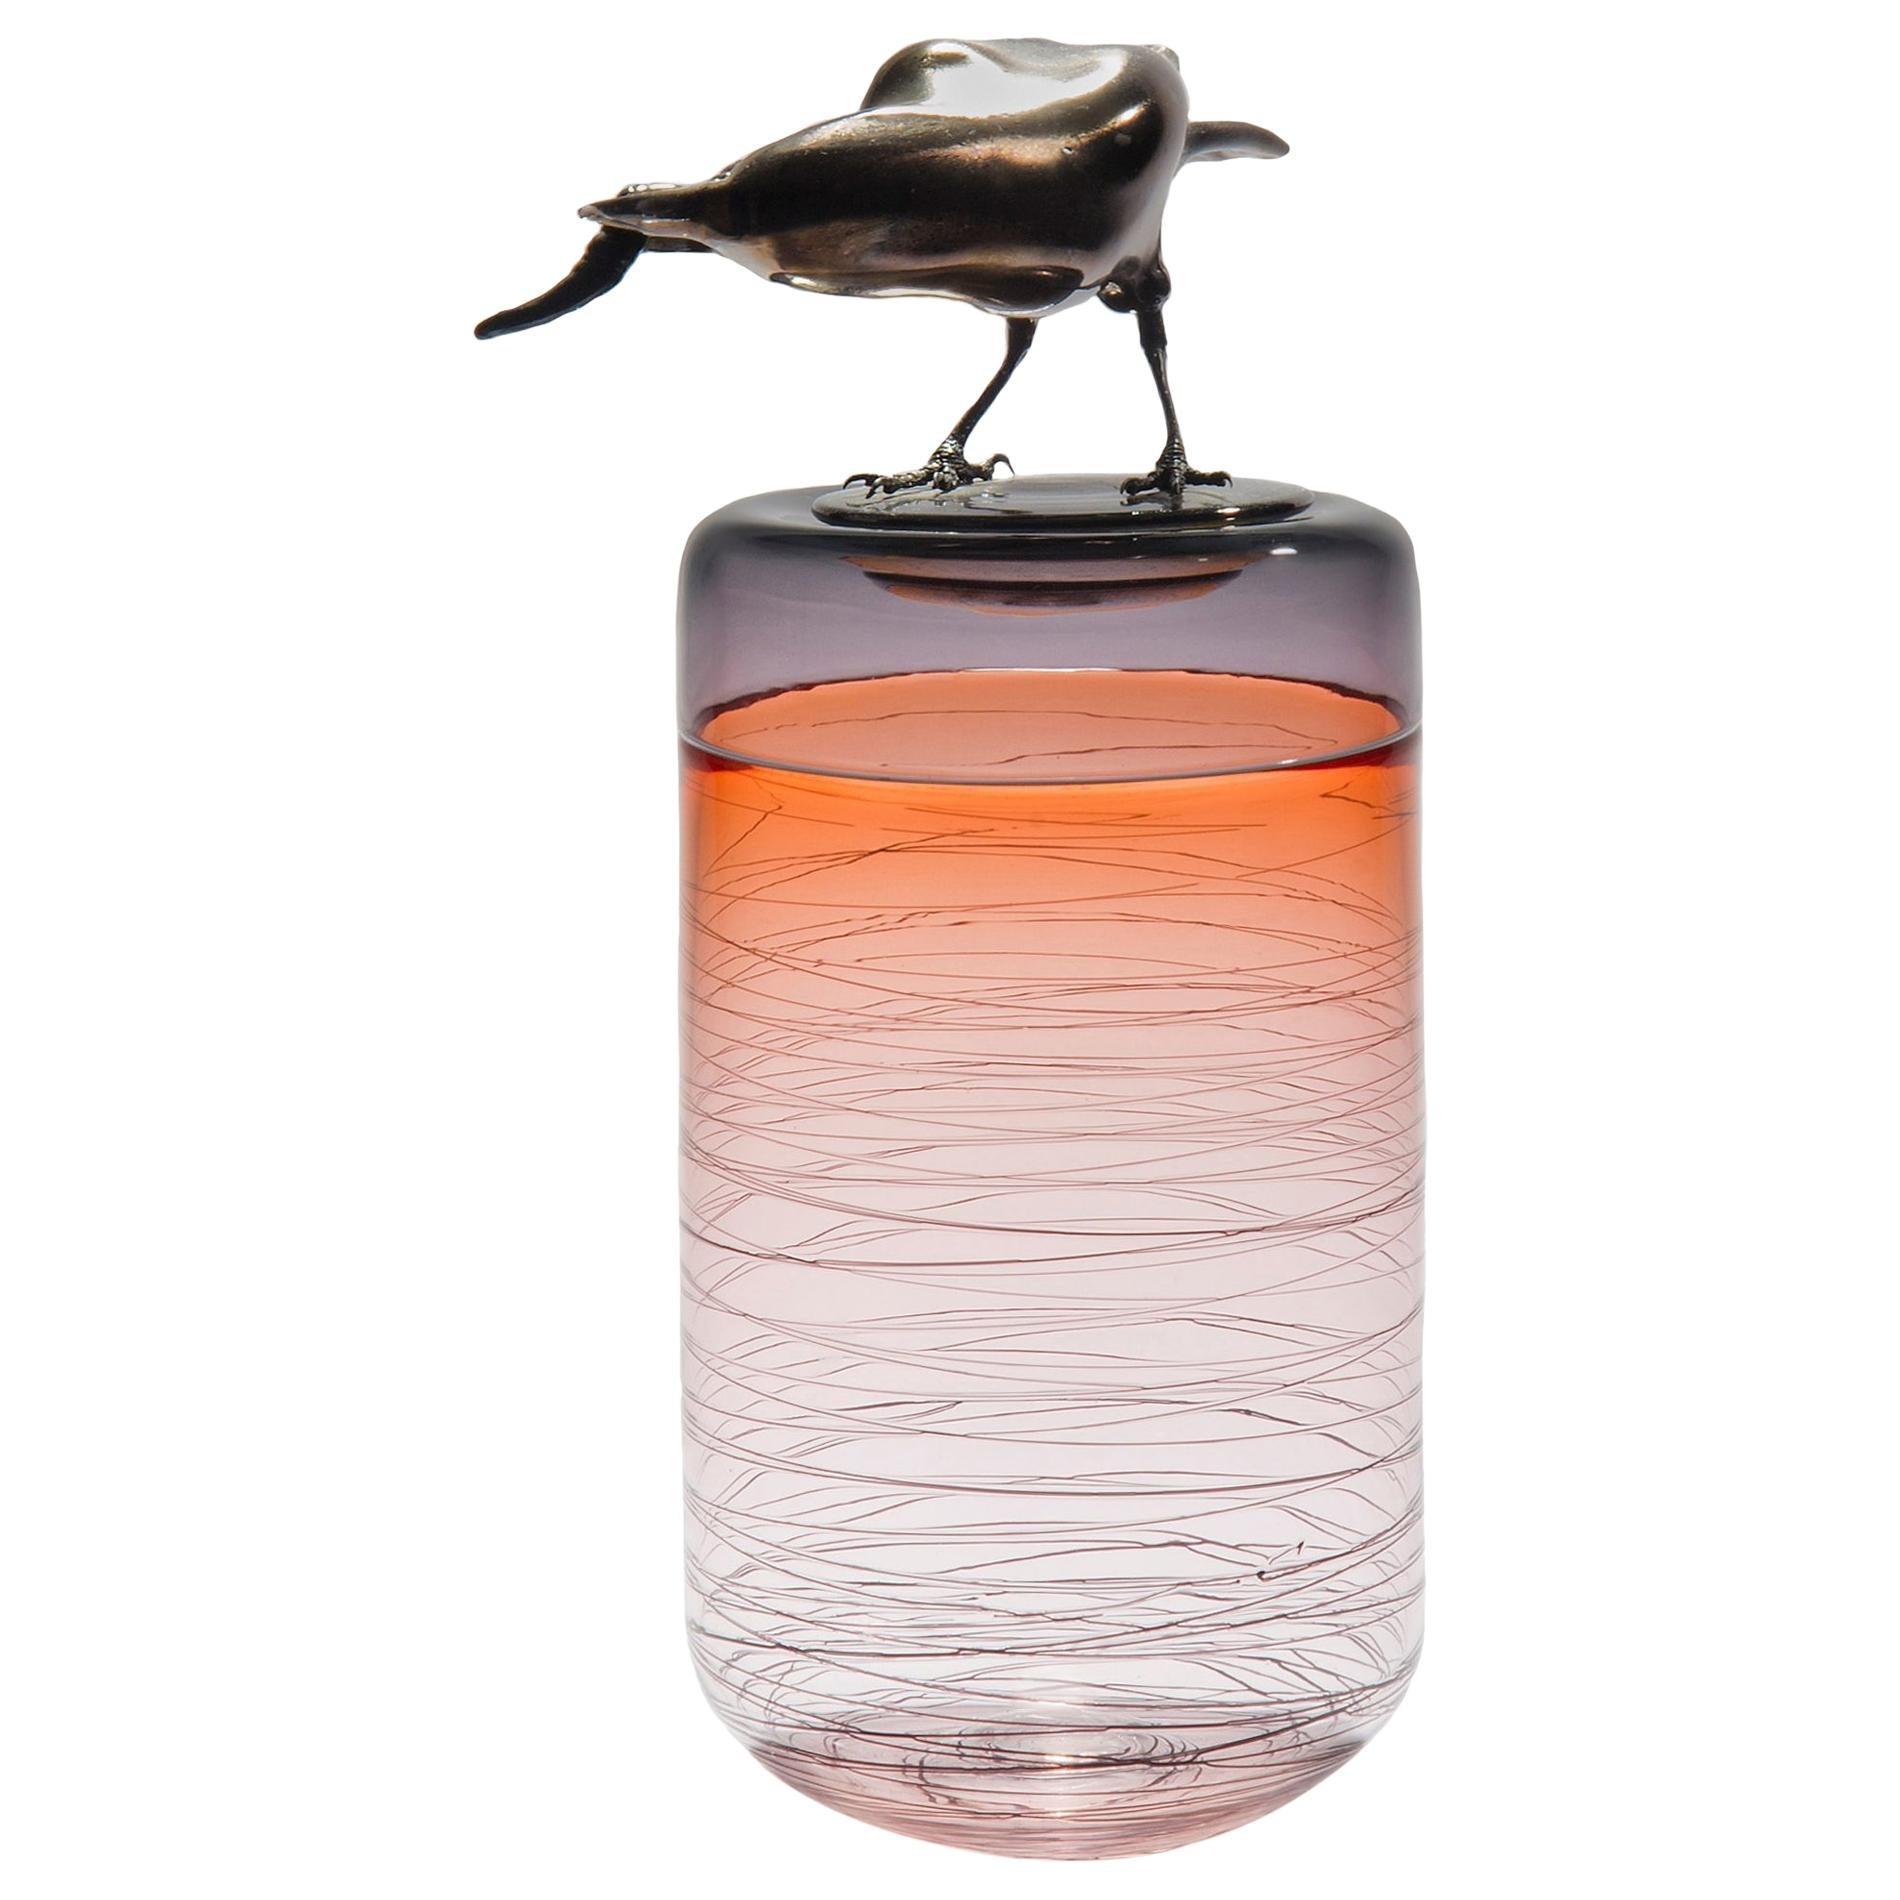 Gourmande, a Unique Glass Sculptural Vase with Black Crow by Julie Johnson